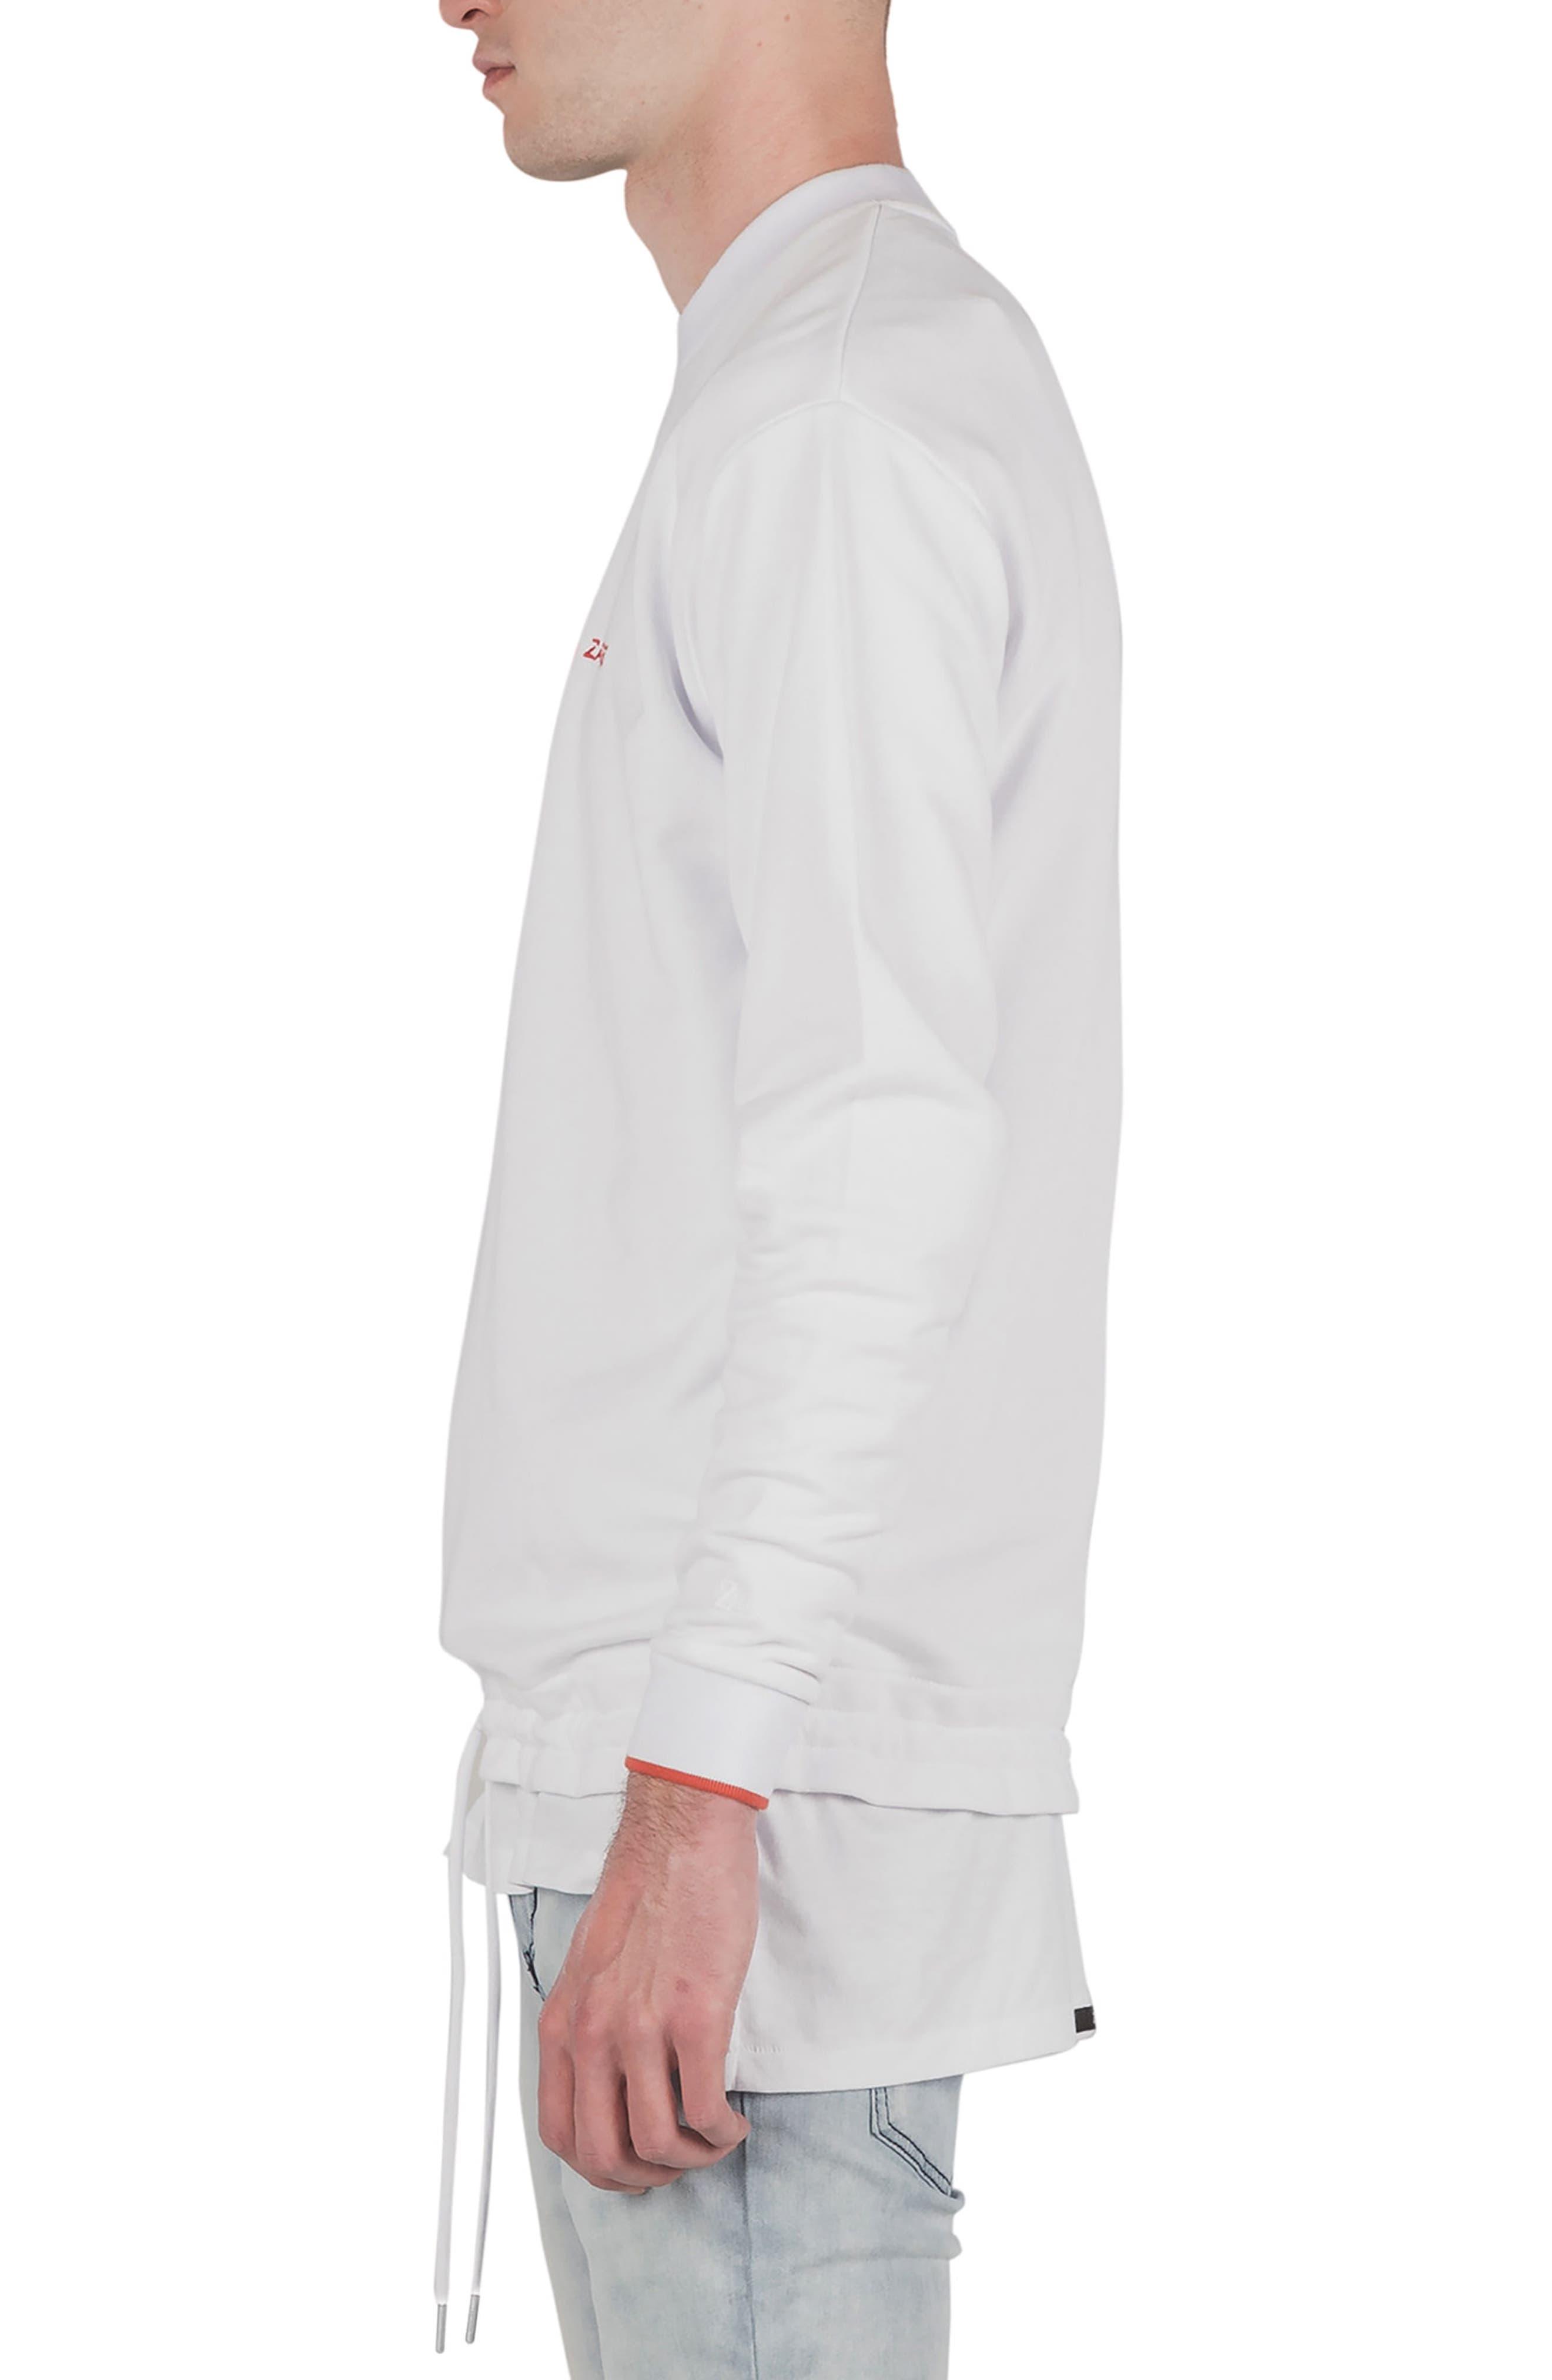 League Boxy Sweatshirt,                             Alternate thumbnail 3, color,                             WHITE